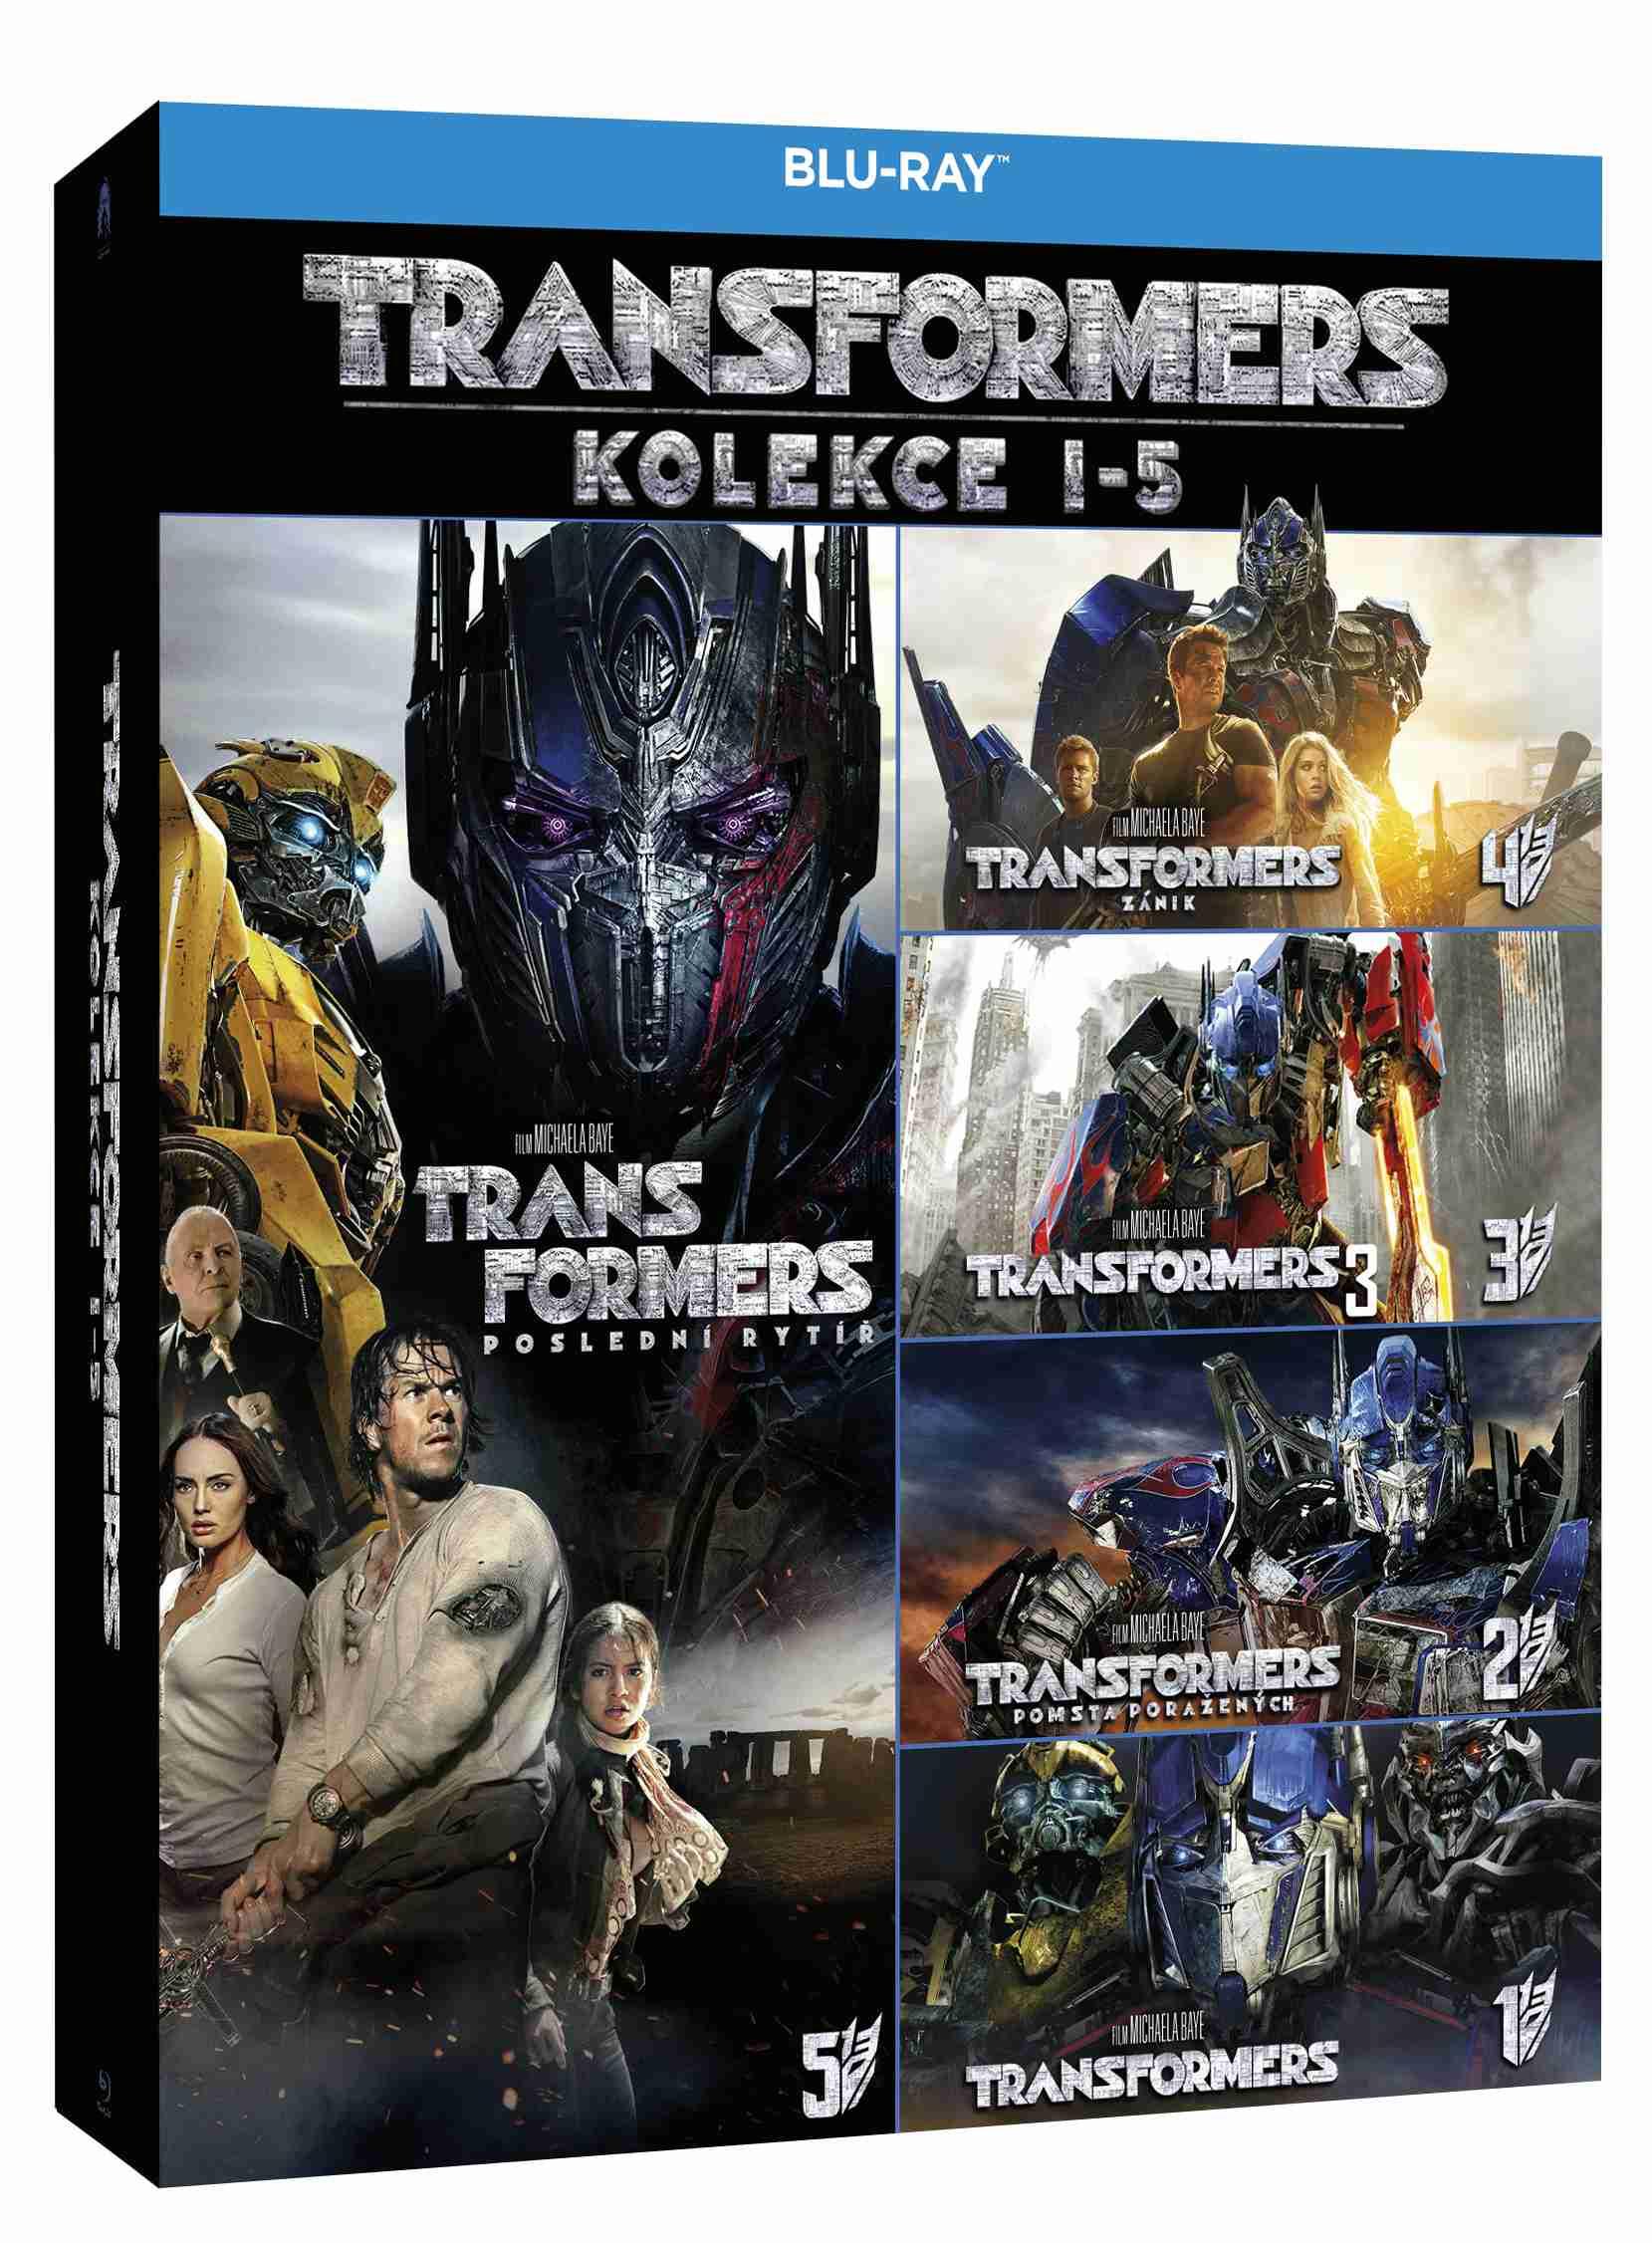 TRANSFORMERS 1-5 KOLEKCE (5 BD) - Blu-ray